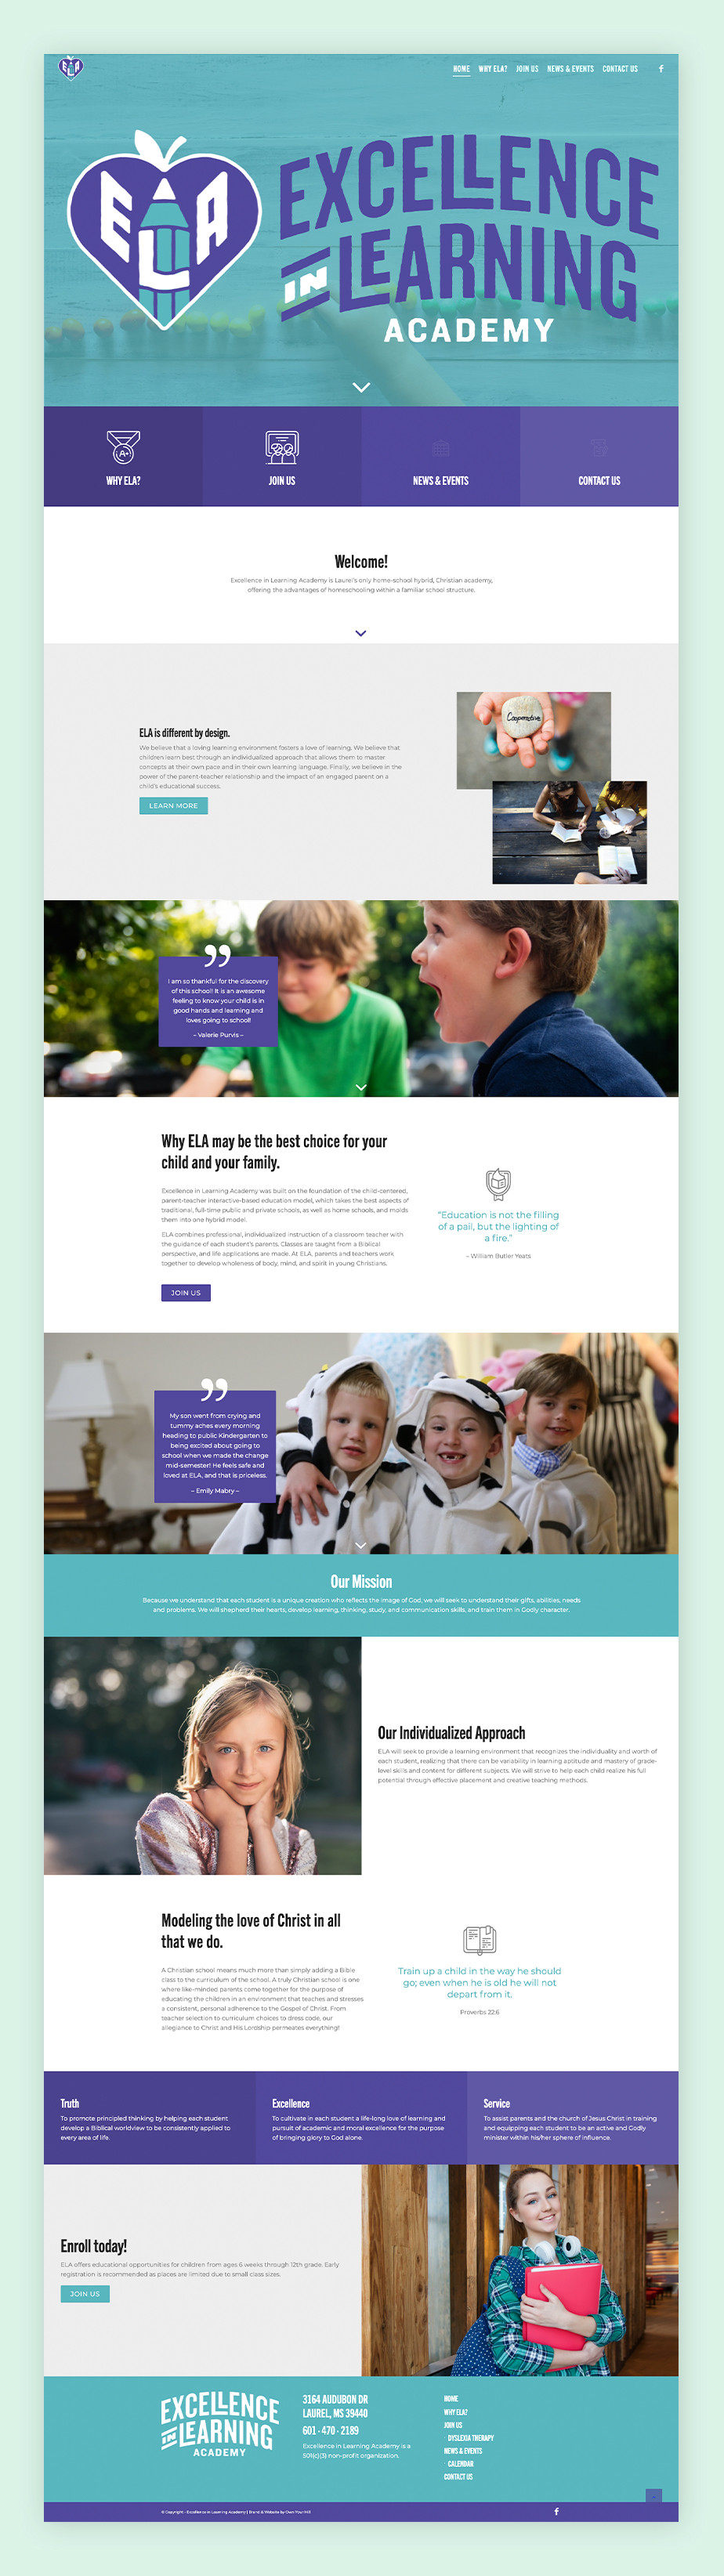 School website example by ELA Academy